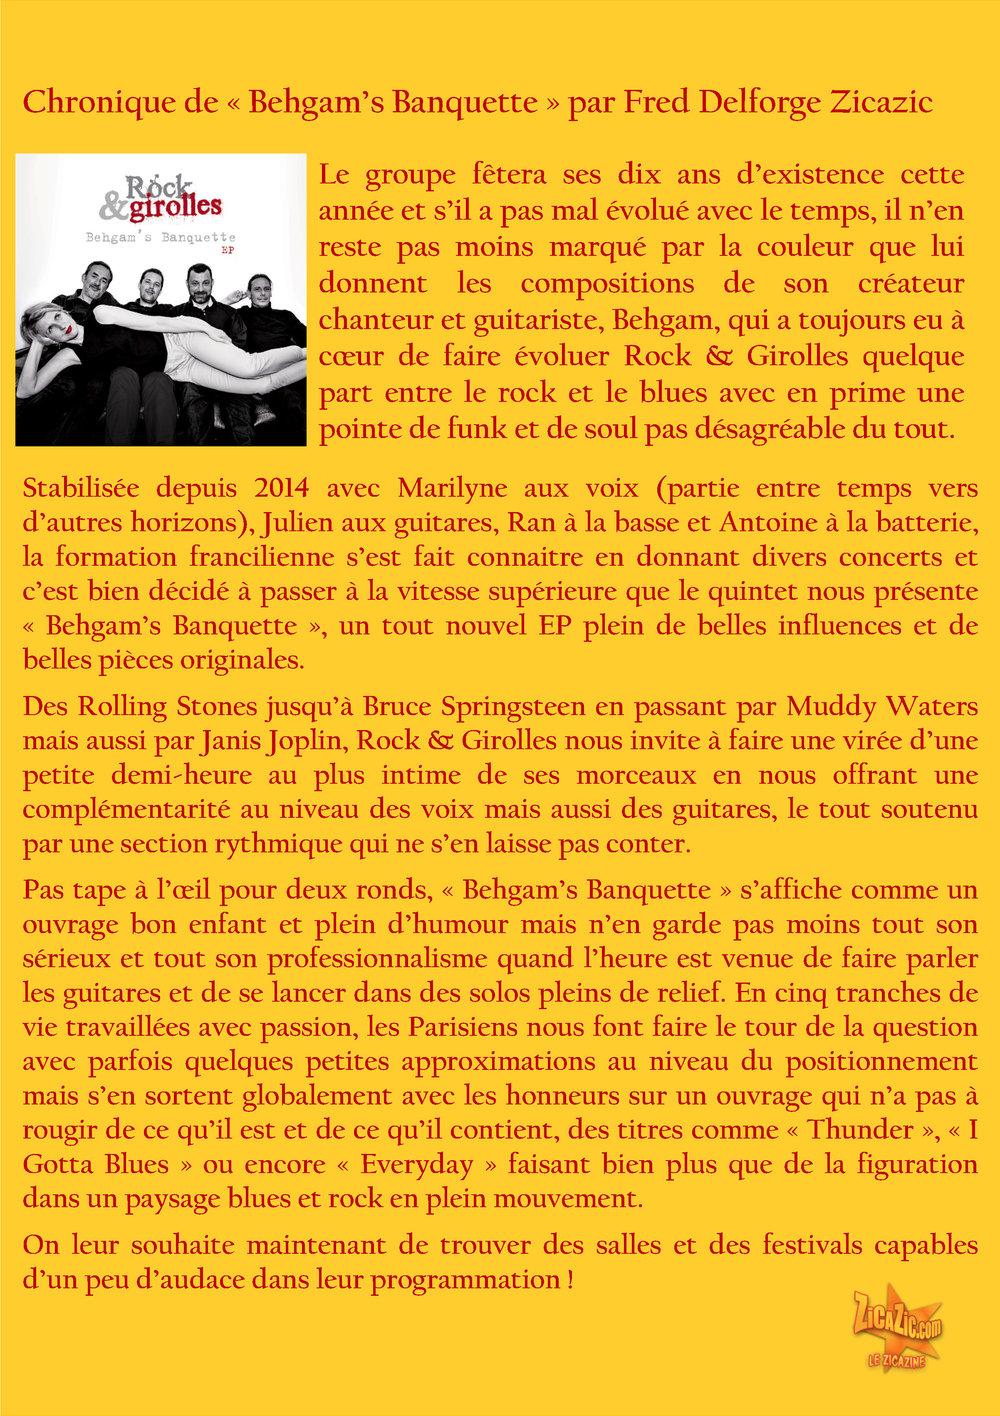 Rock & girolles G chronique EP ZICAZIC